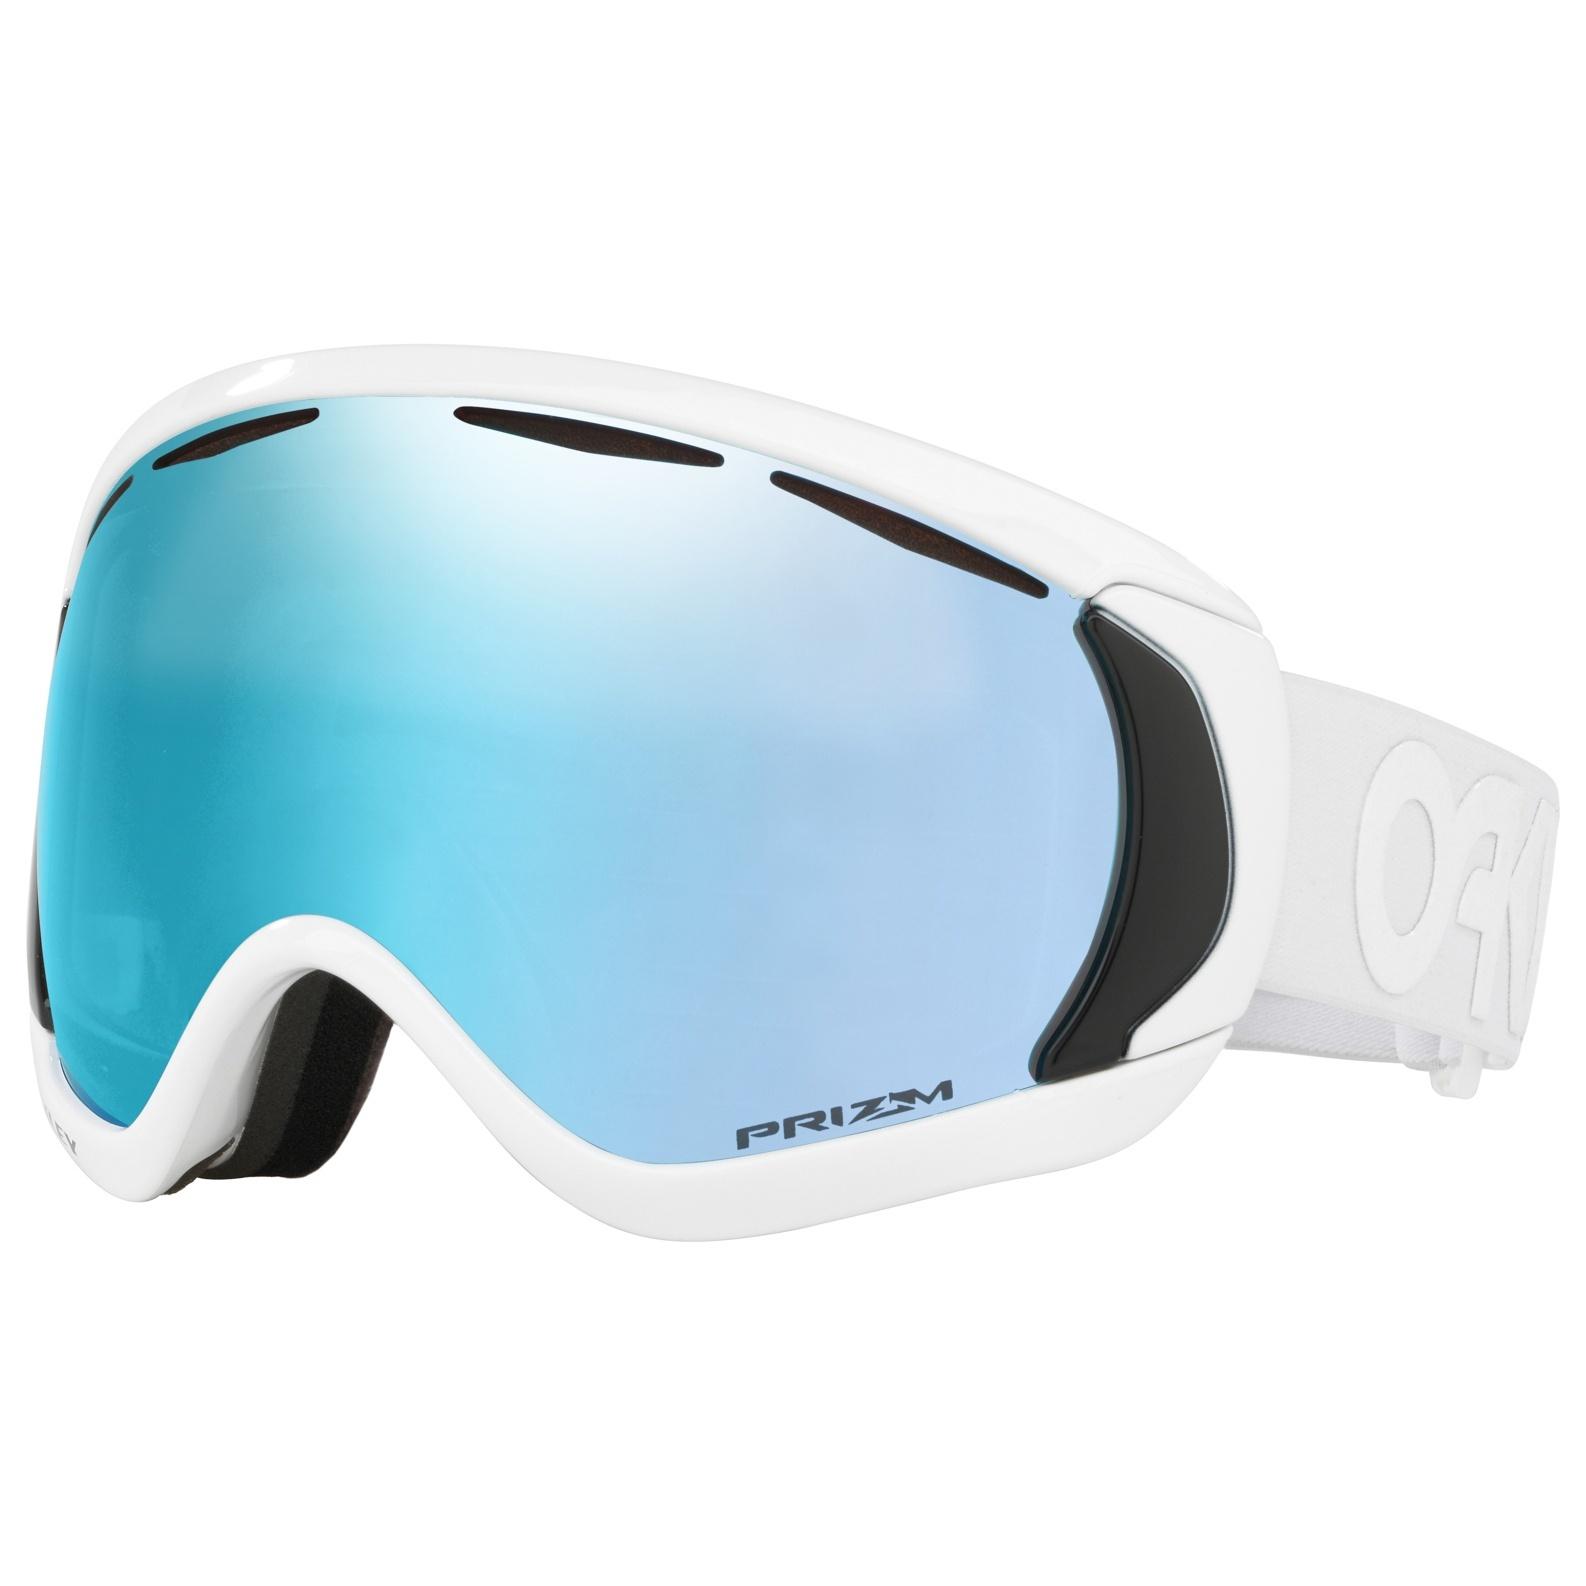 c86e32f1bb50 ... Men s Oakley Canopy Goggles · All Goggles · All Oakley Gear. Factory  Pilot Whiteout with Prizm Sapphire Iridium ...